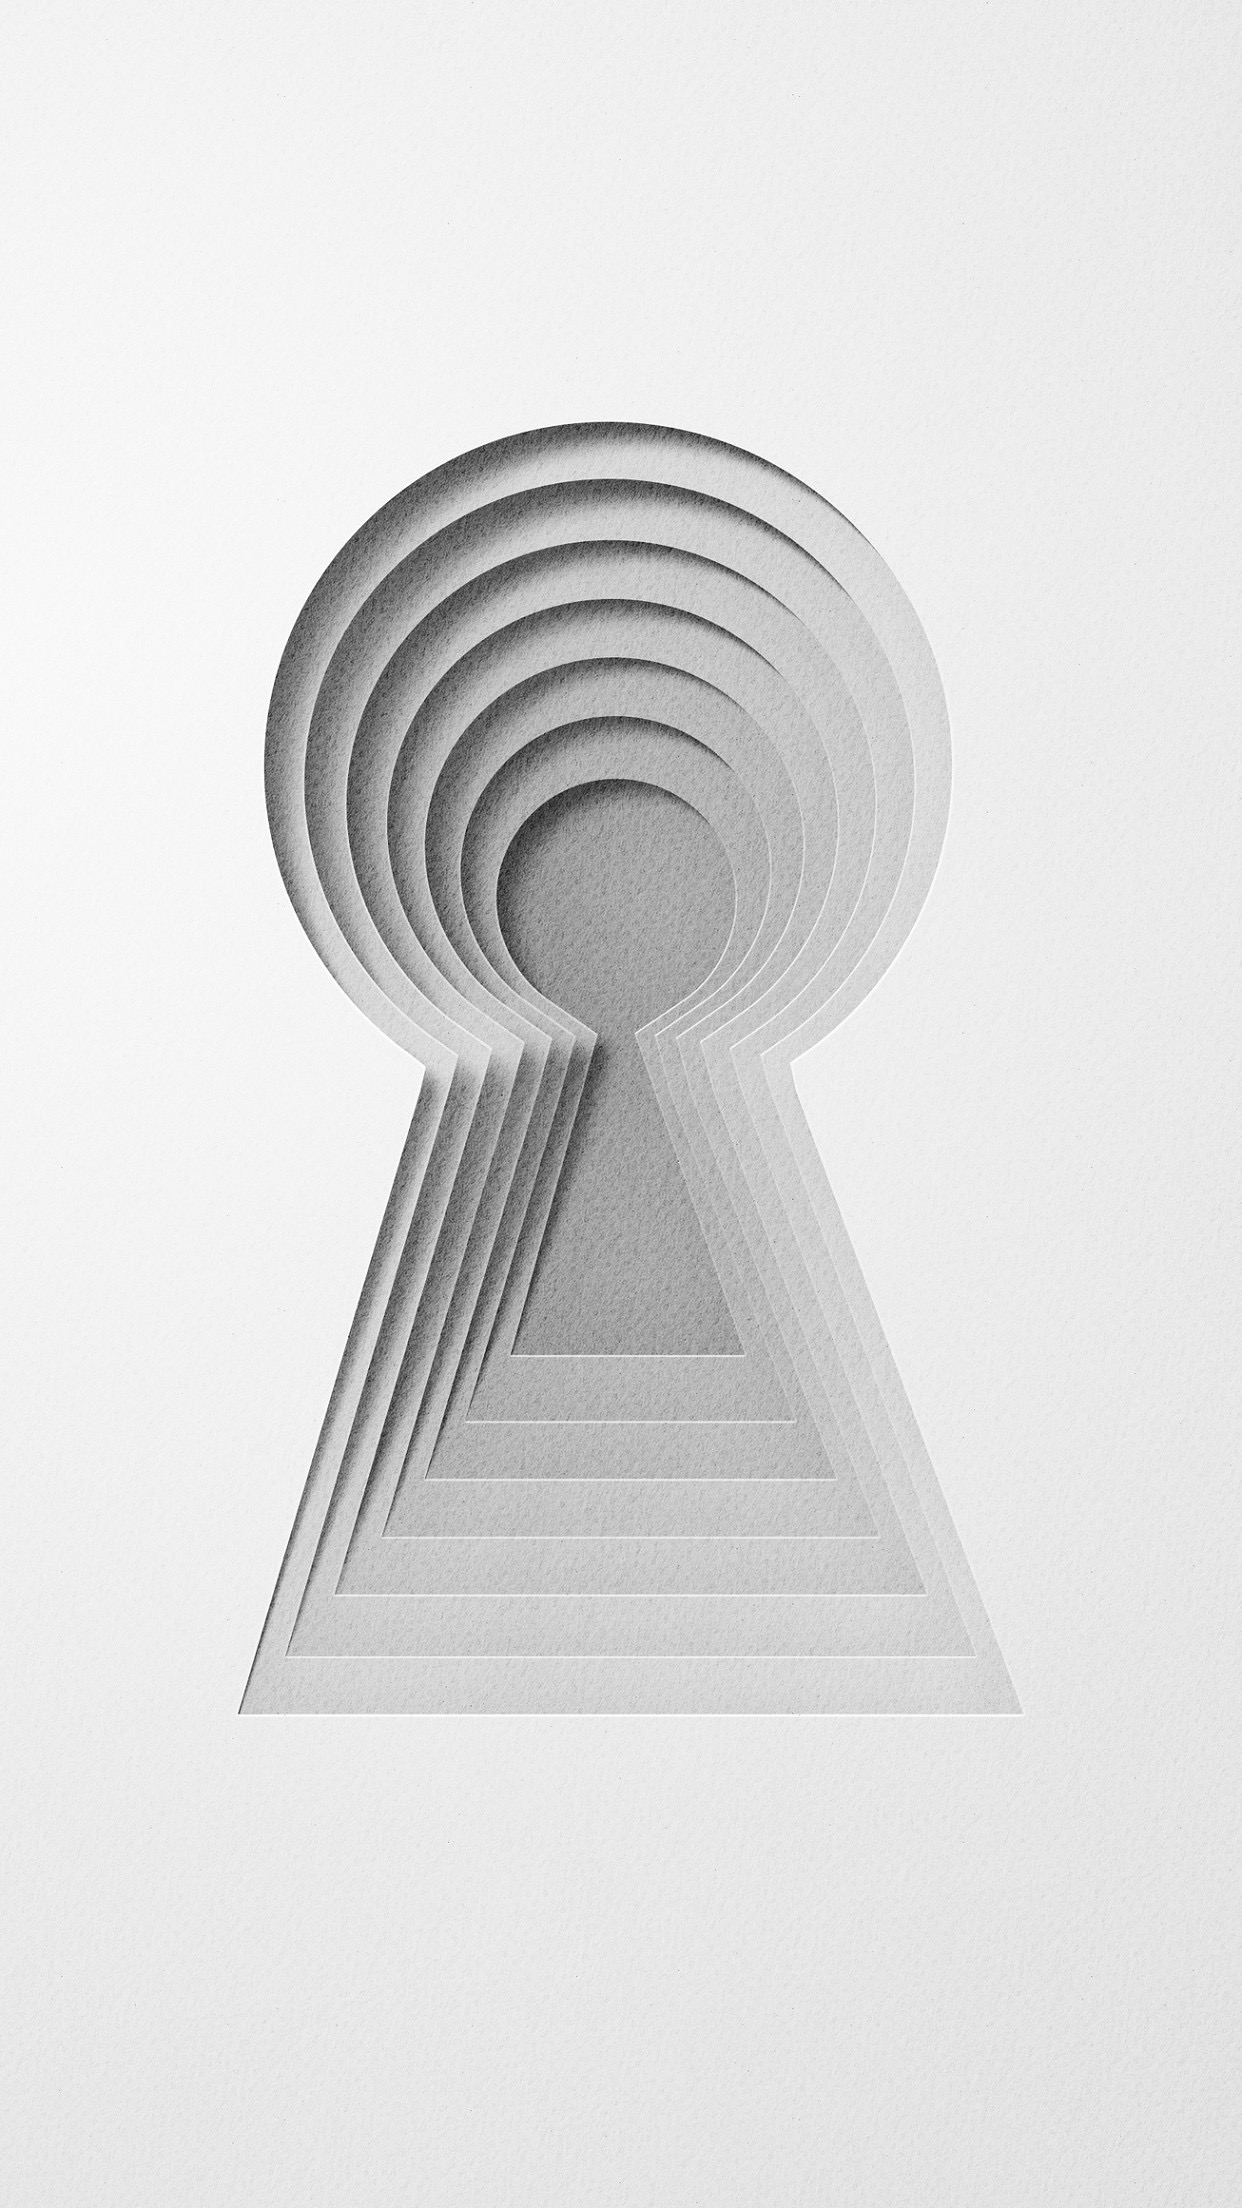 Eiko Ojala - 爱沙尼亚设计师 Eiko Ojala 纸艺作品